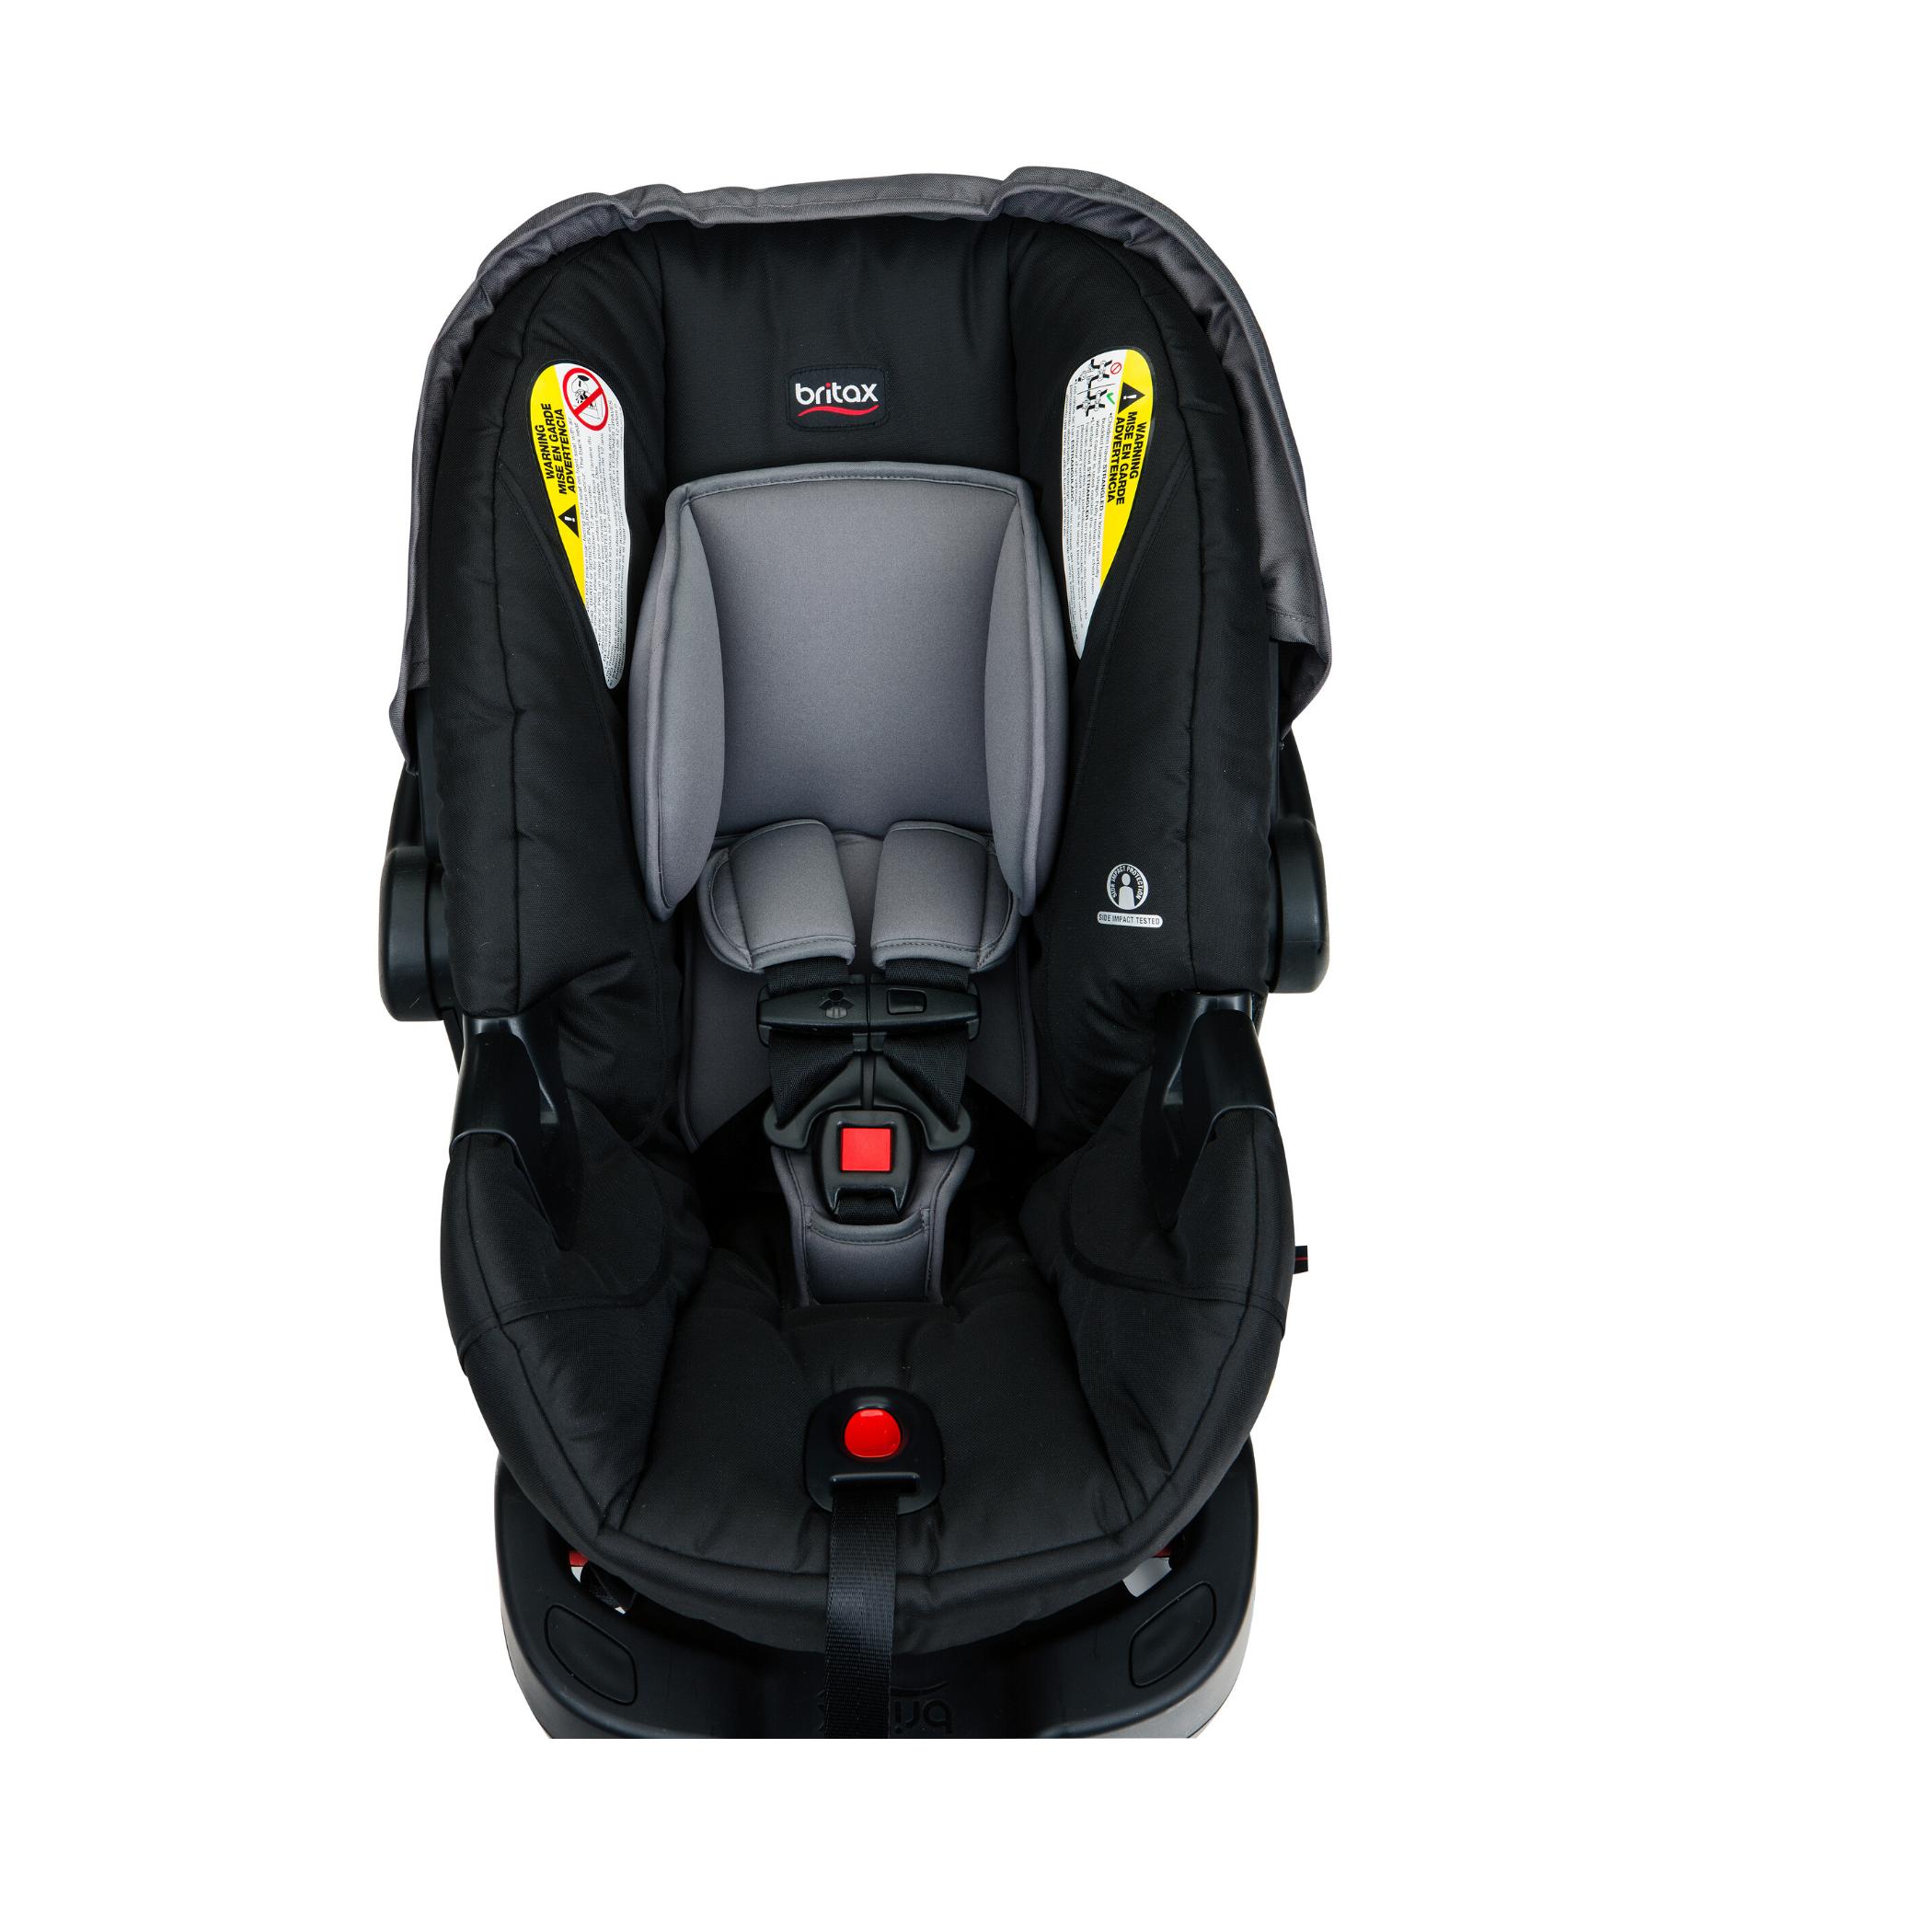 B Safe 35 Infant Car Seat Dove Britax, How To Clean Britax B Safe 35 Car Seat